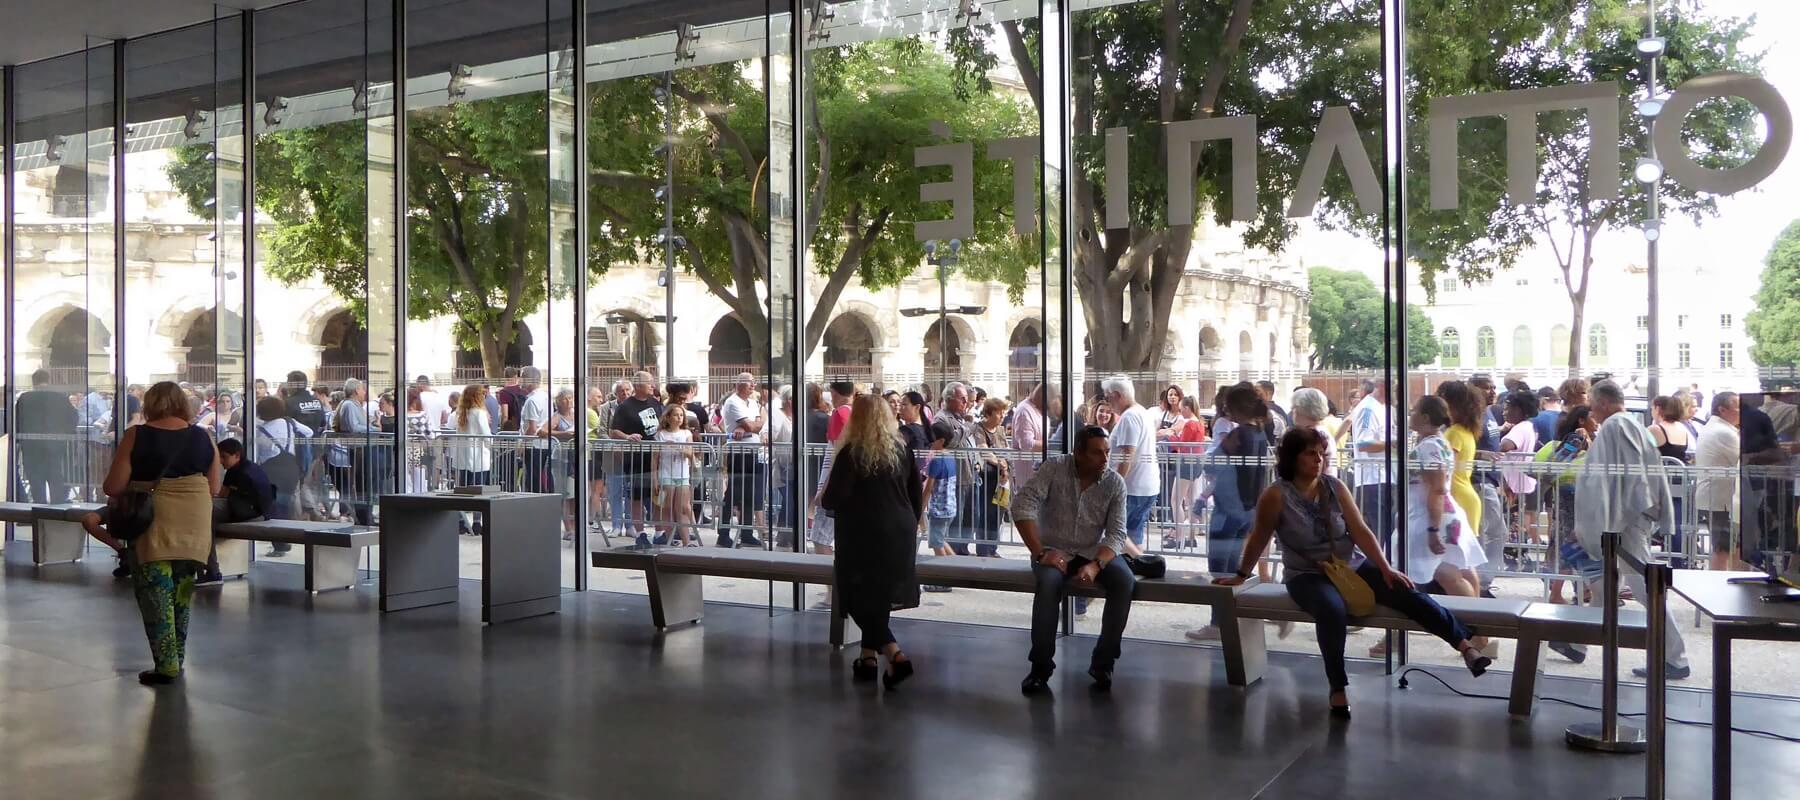 Internationaler Museumstag 2019 - Das Erbe Roms